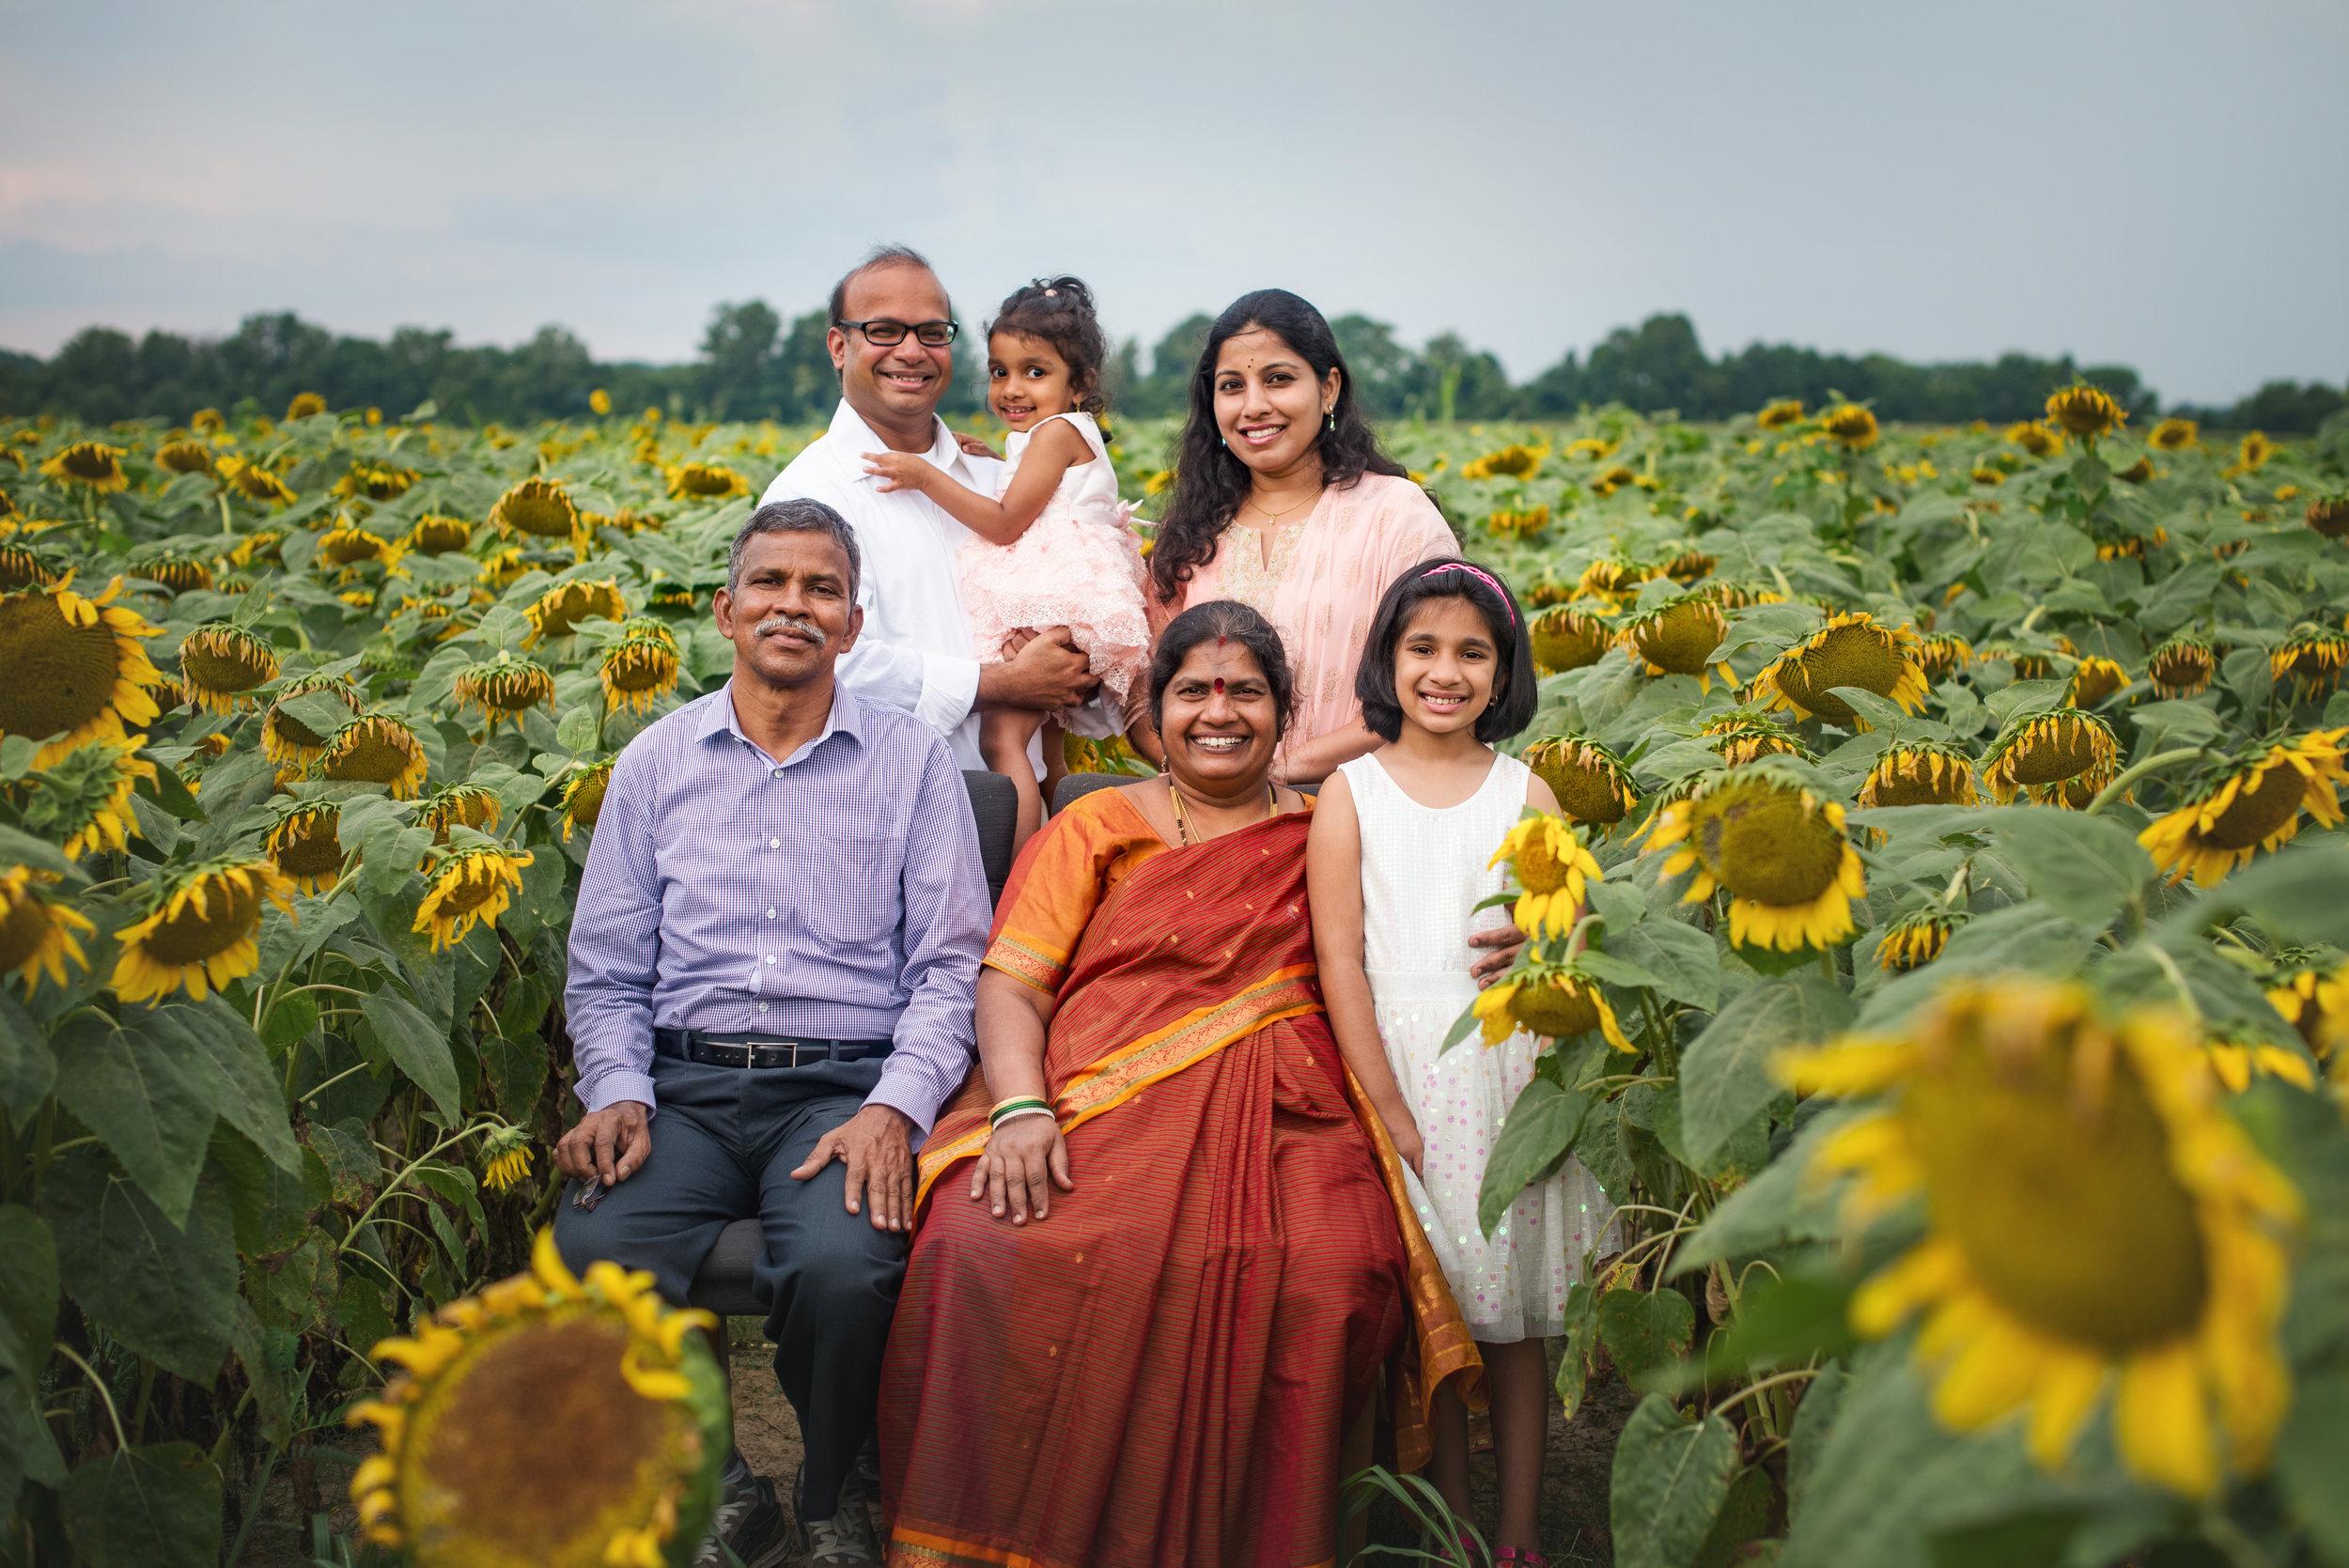 memphisfamilysessionvangari-1.jpg